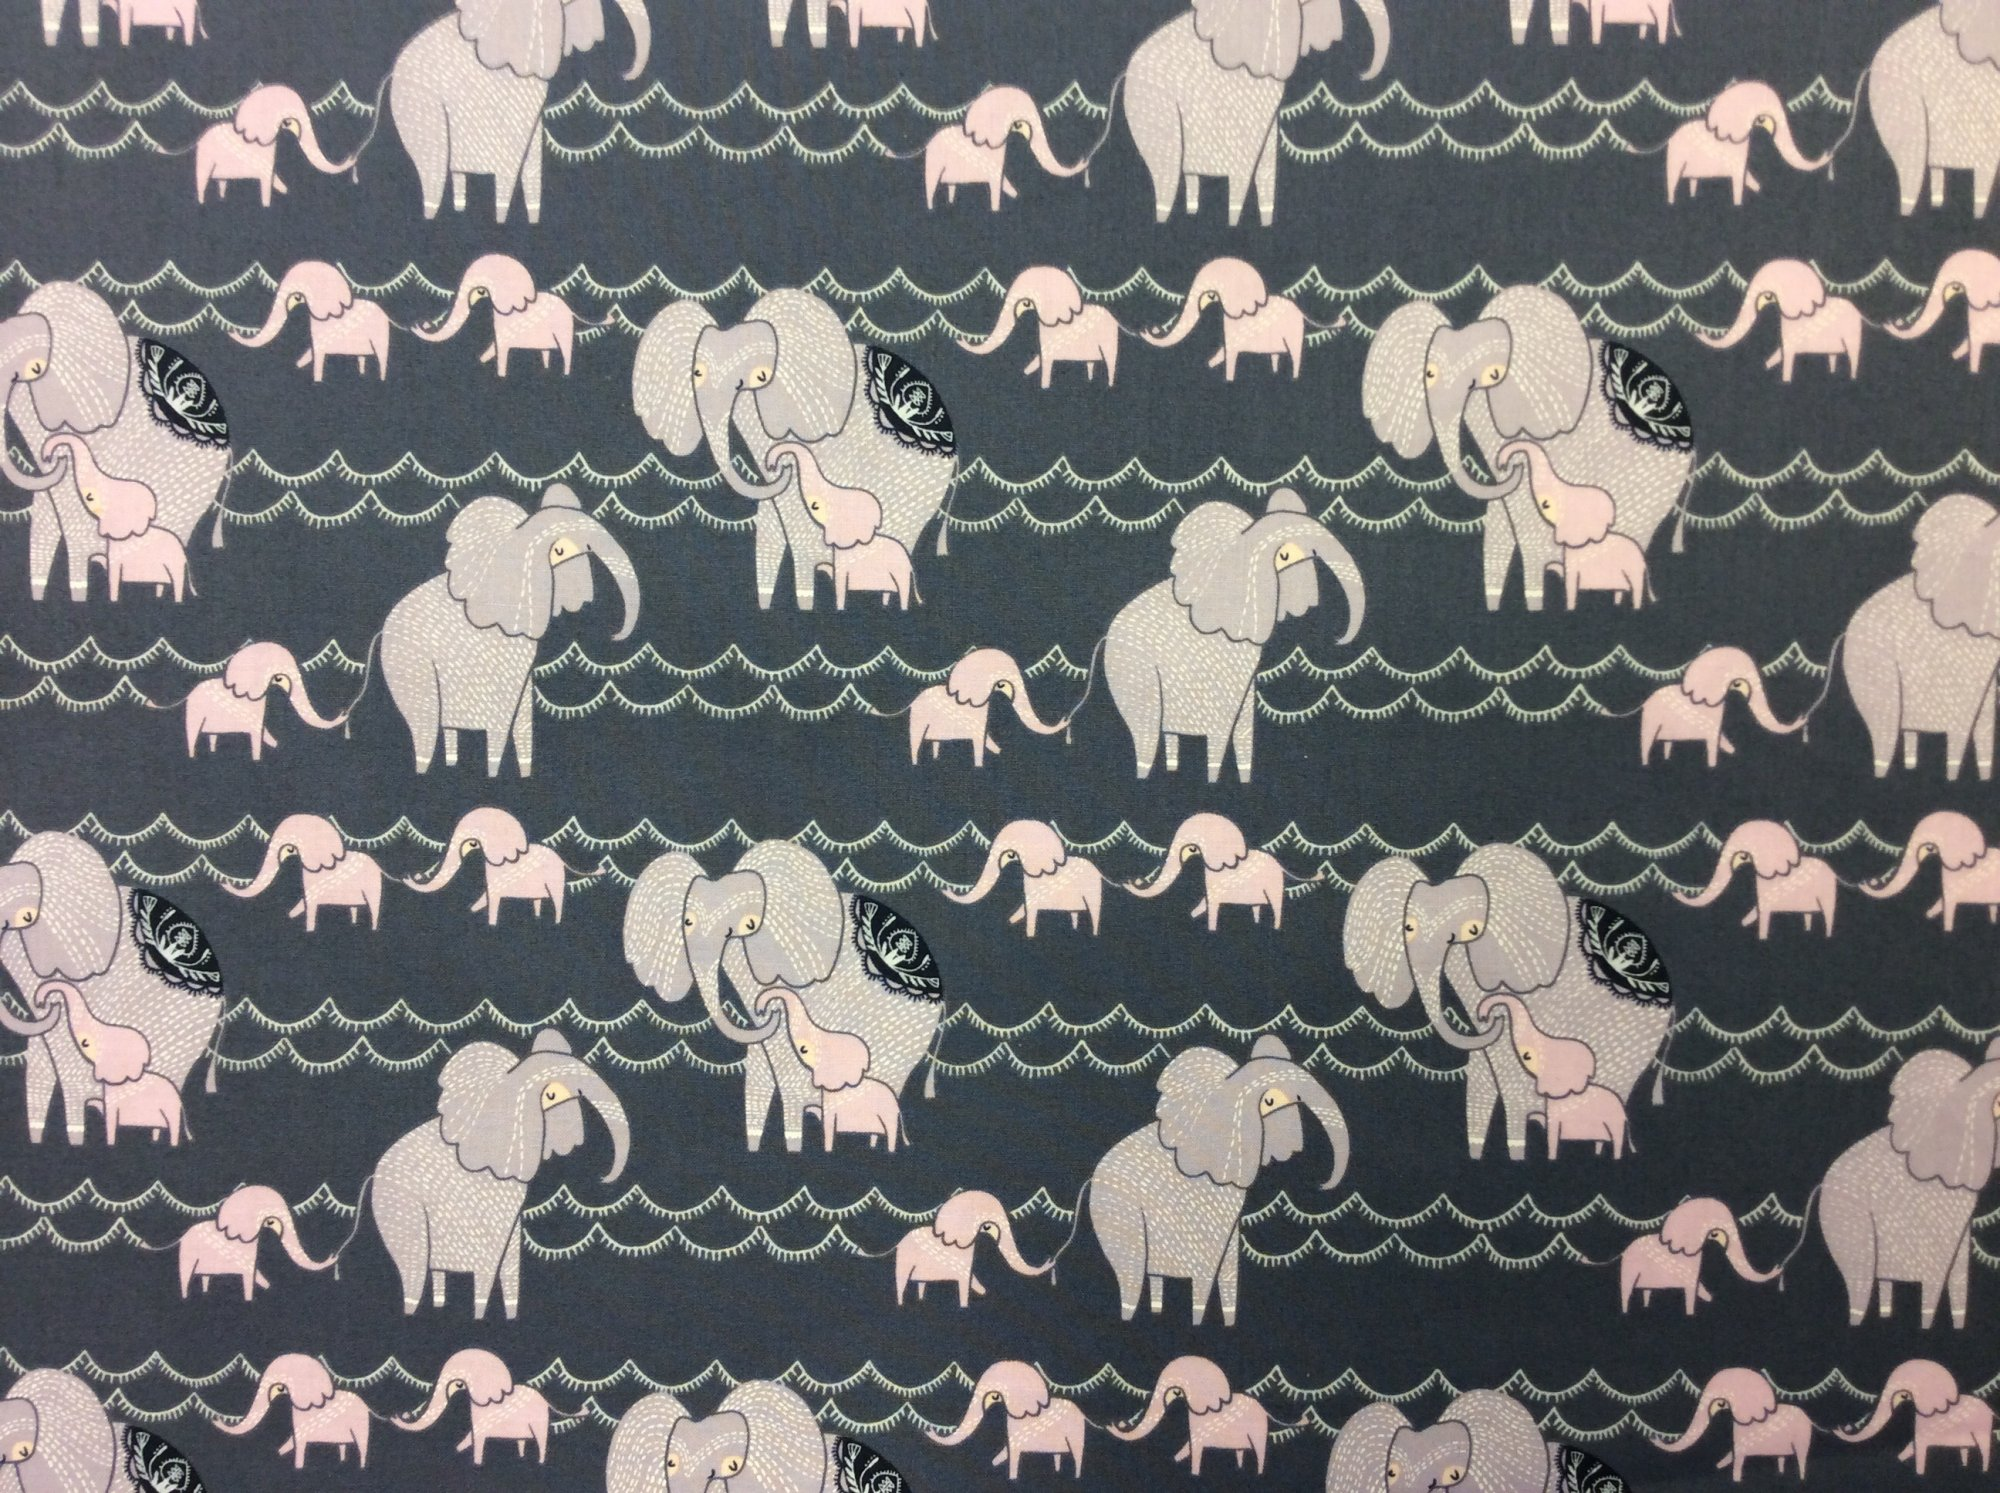 Elephants Retro Cotton Quilt Fabric FT126